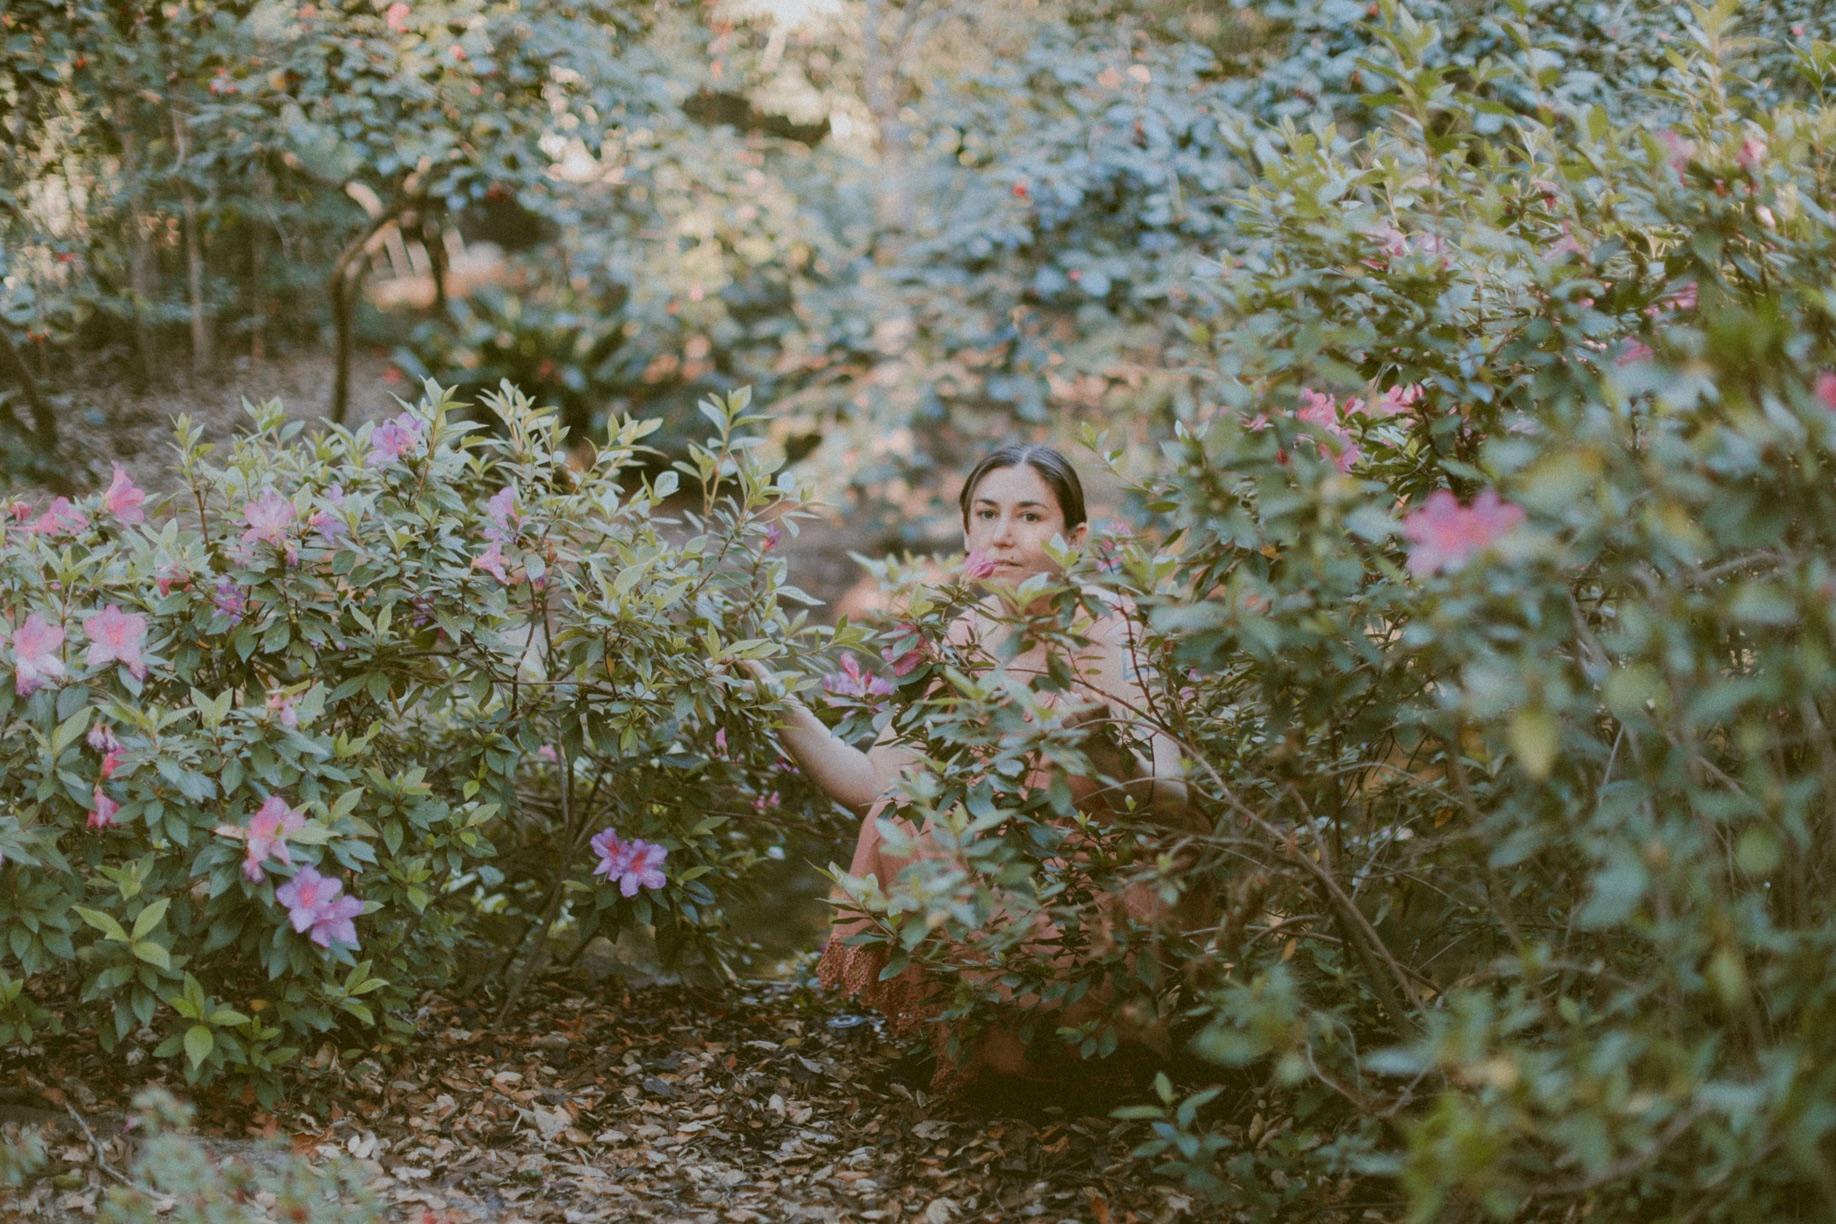 All photography by Alexandra Kacha.